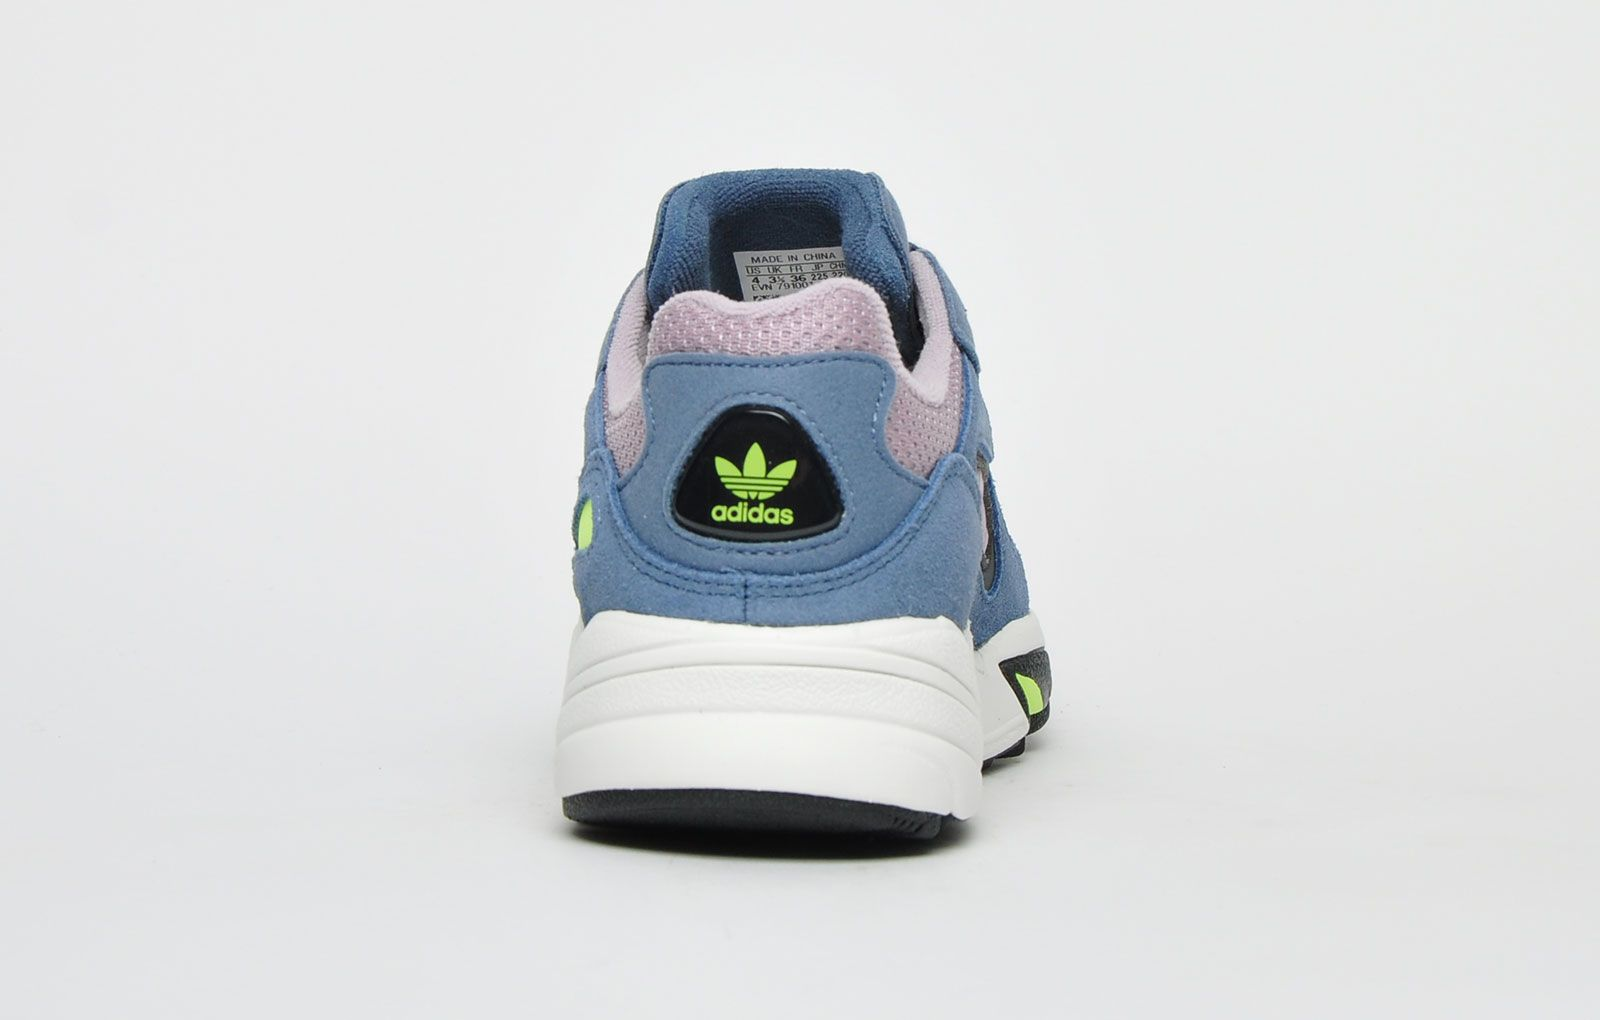 Adidas Originals Yung-96 Chasm Junior